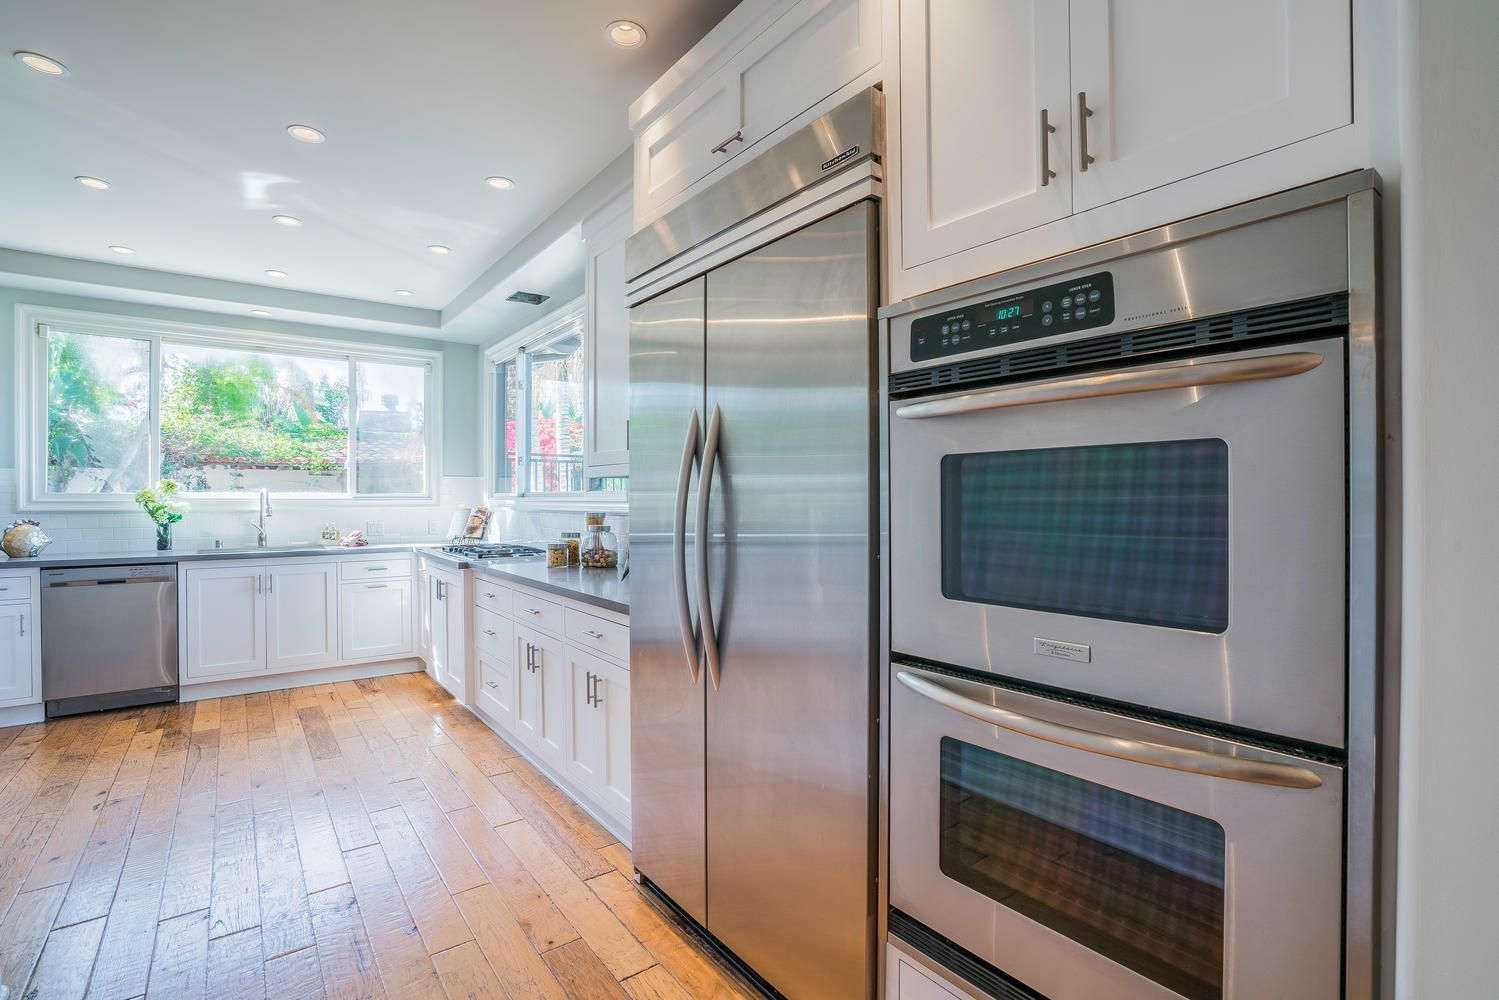 Side Refrigerator Freezer Double Ovens